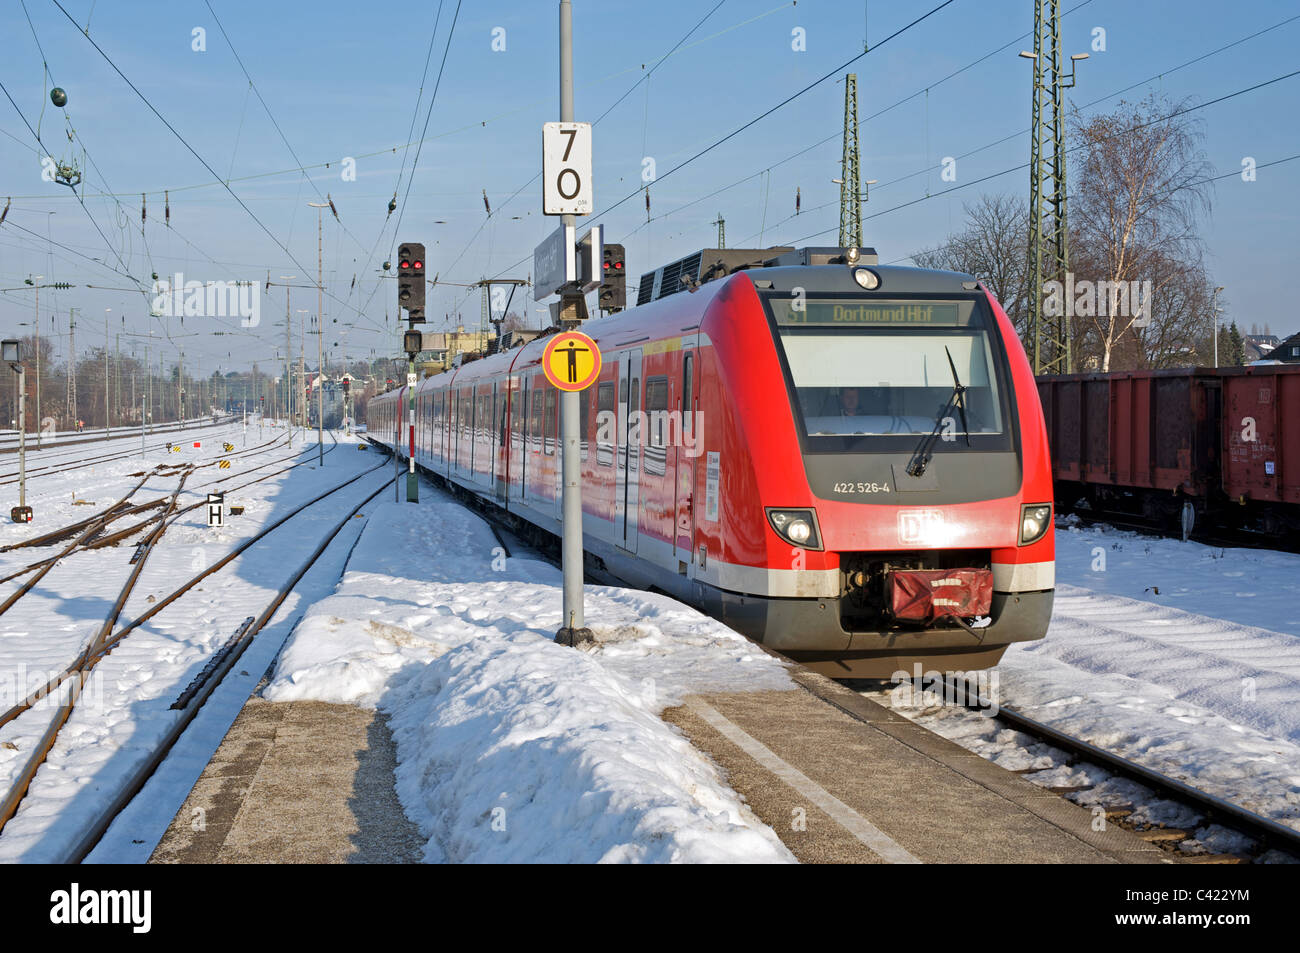 S Bahn (suburban railway) Solingen, Germany. Stock Photo